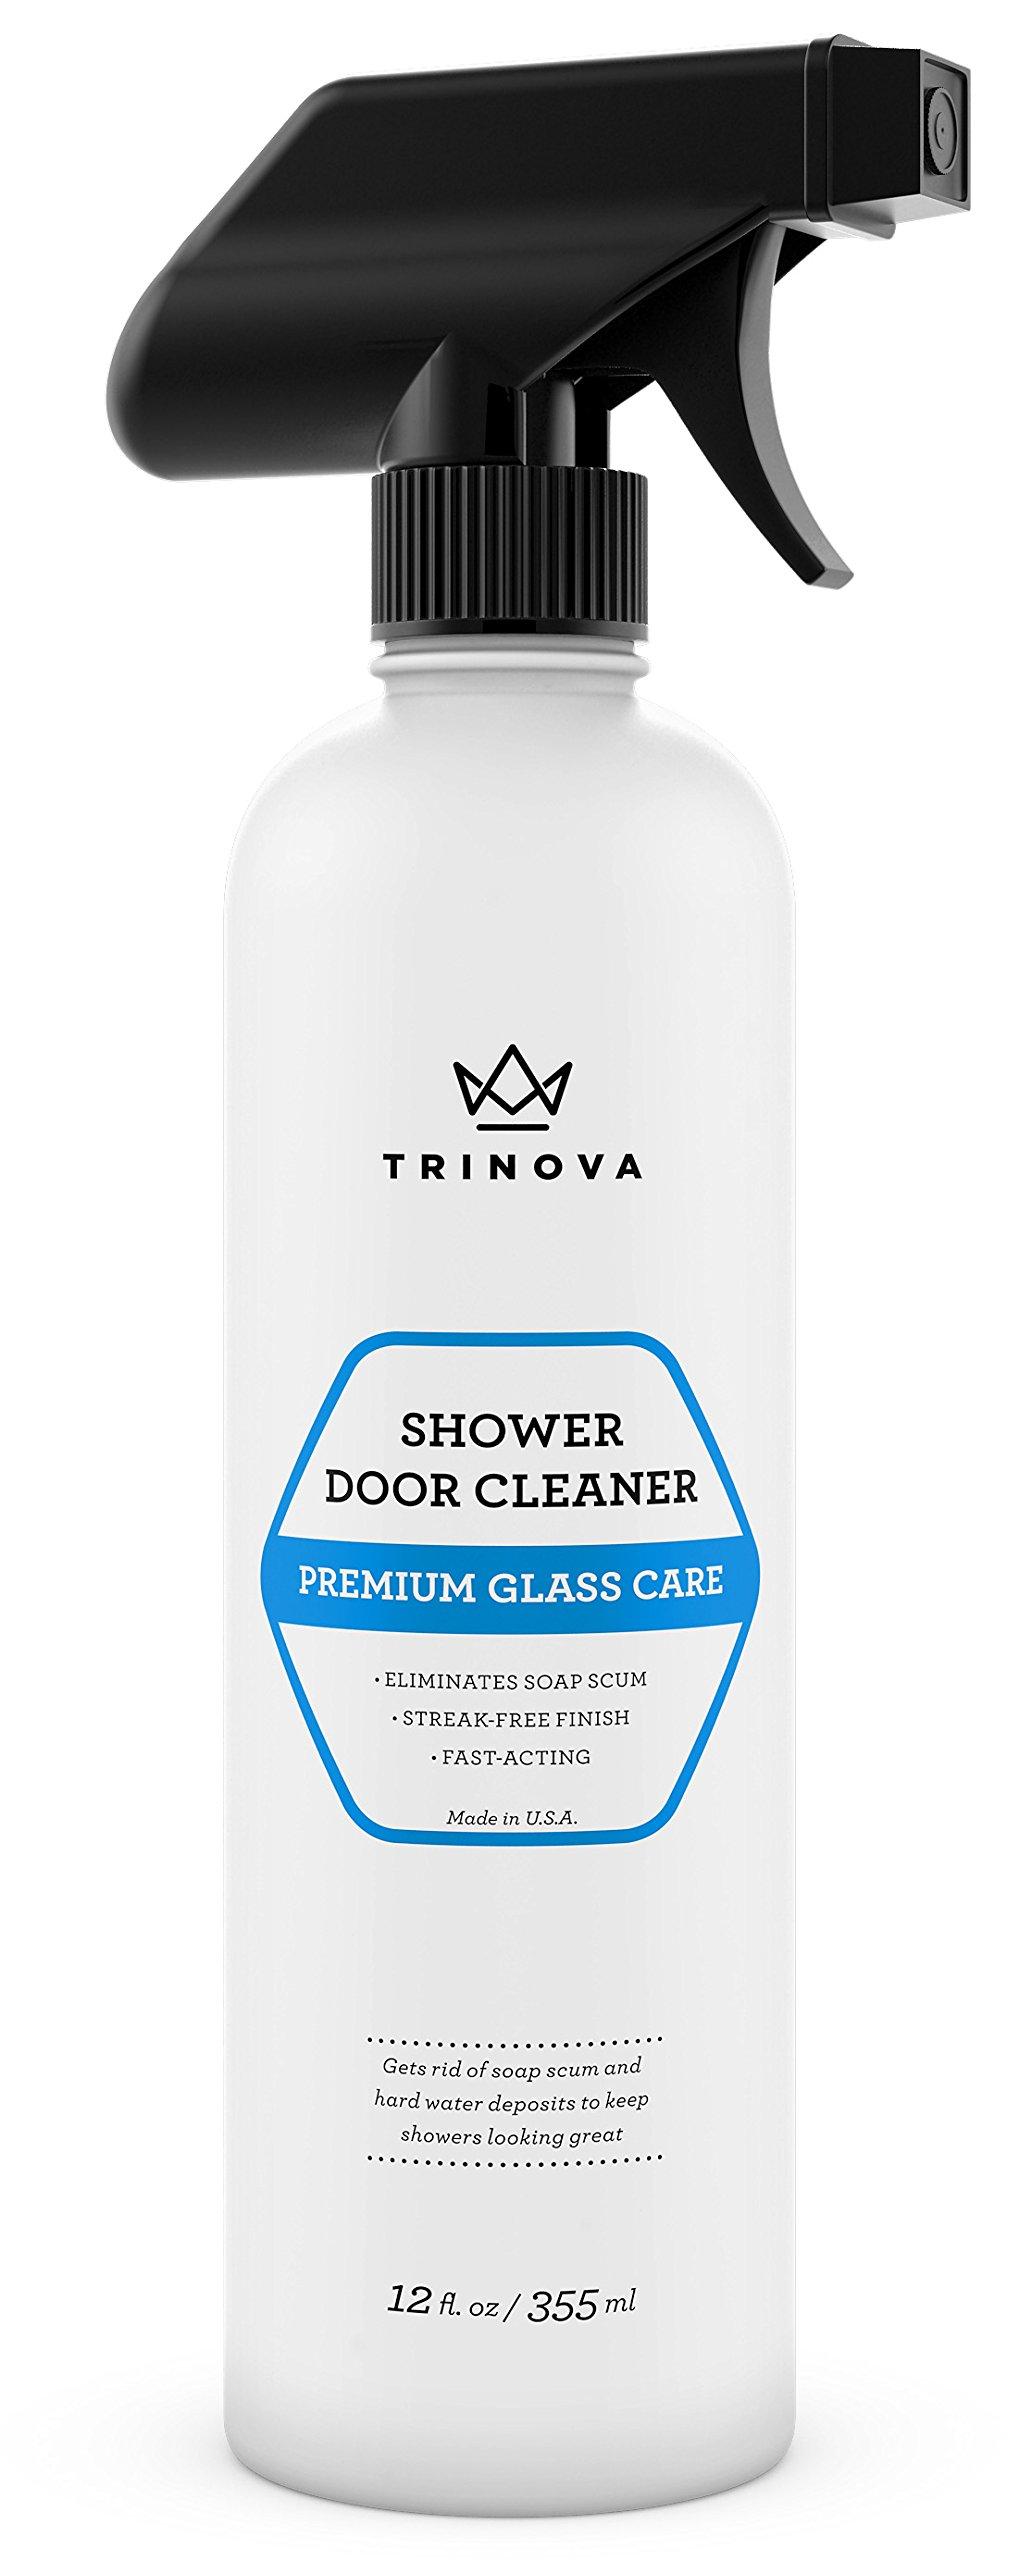 Amazon Hard Water Stain Remover Shower Door Cleaner Soap Scum